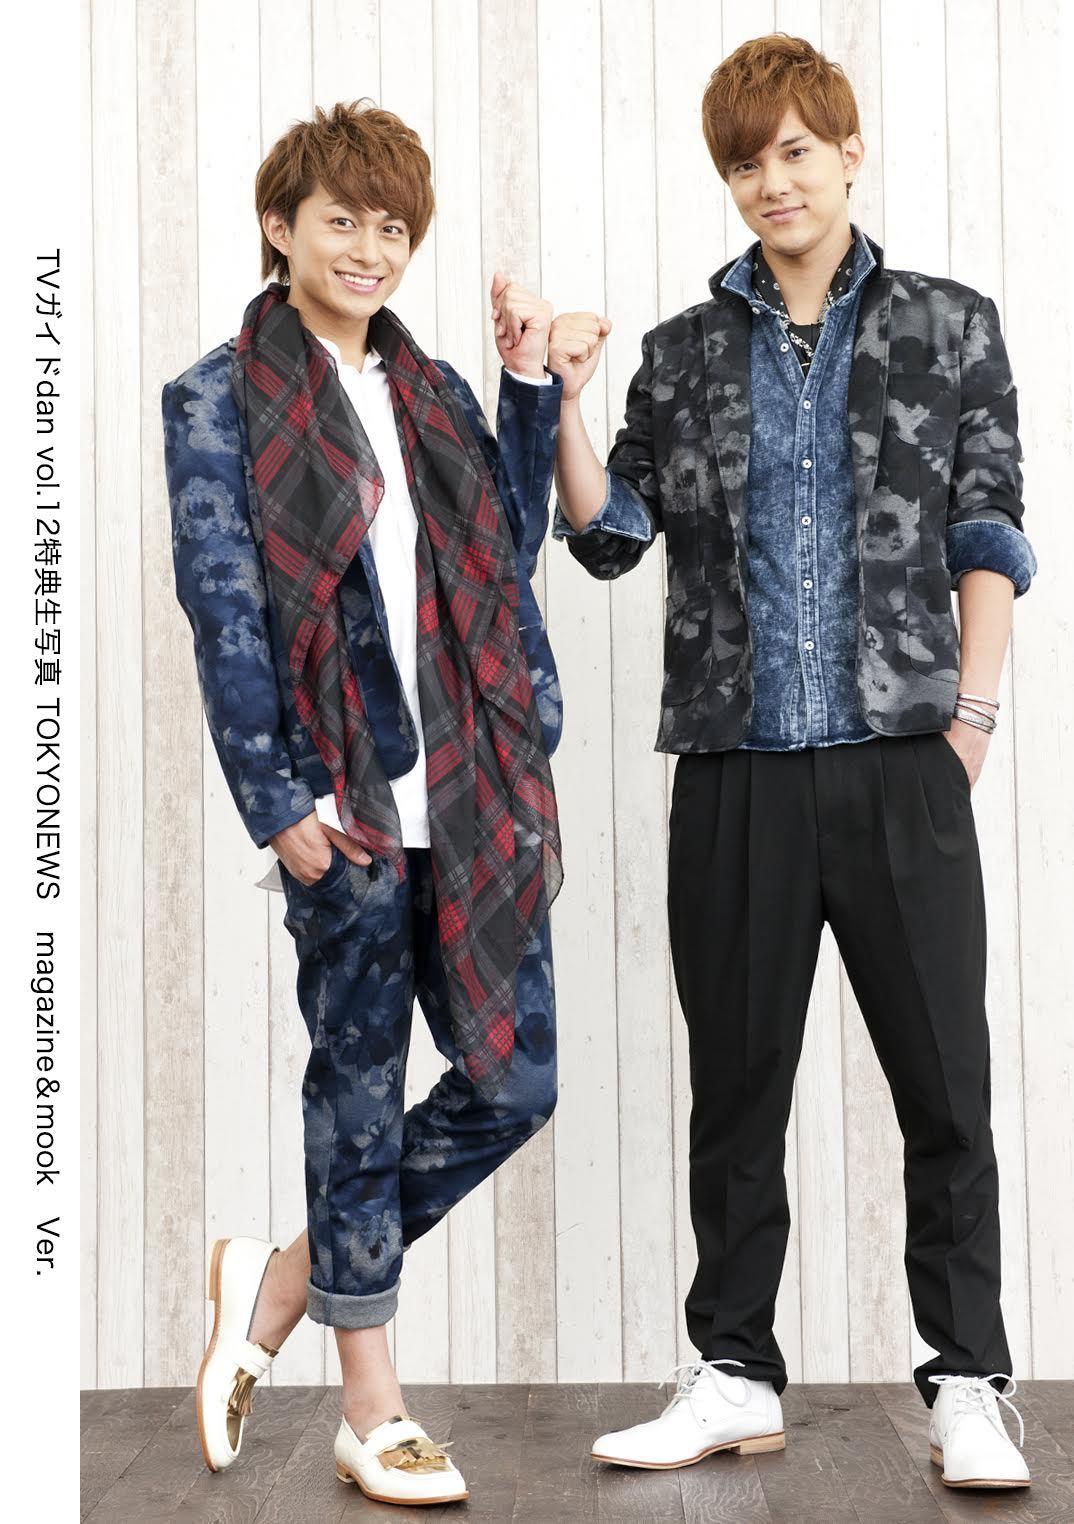 一部書店の特典 BOYS AND MEN・水野勝&小林豊の生写真 【TOKYONEWS magazine&mook Ver.】